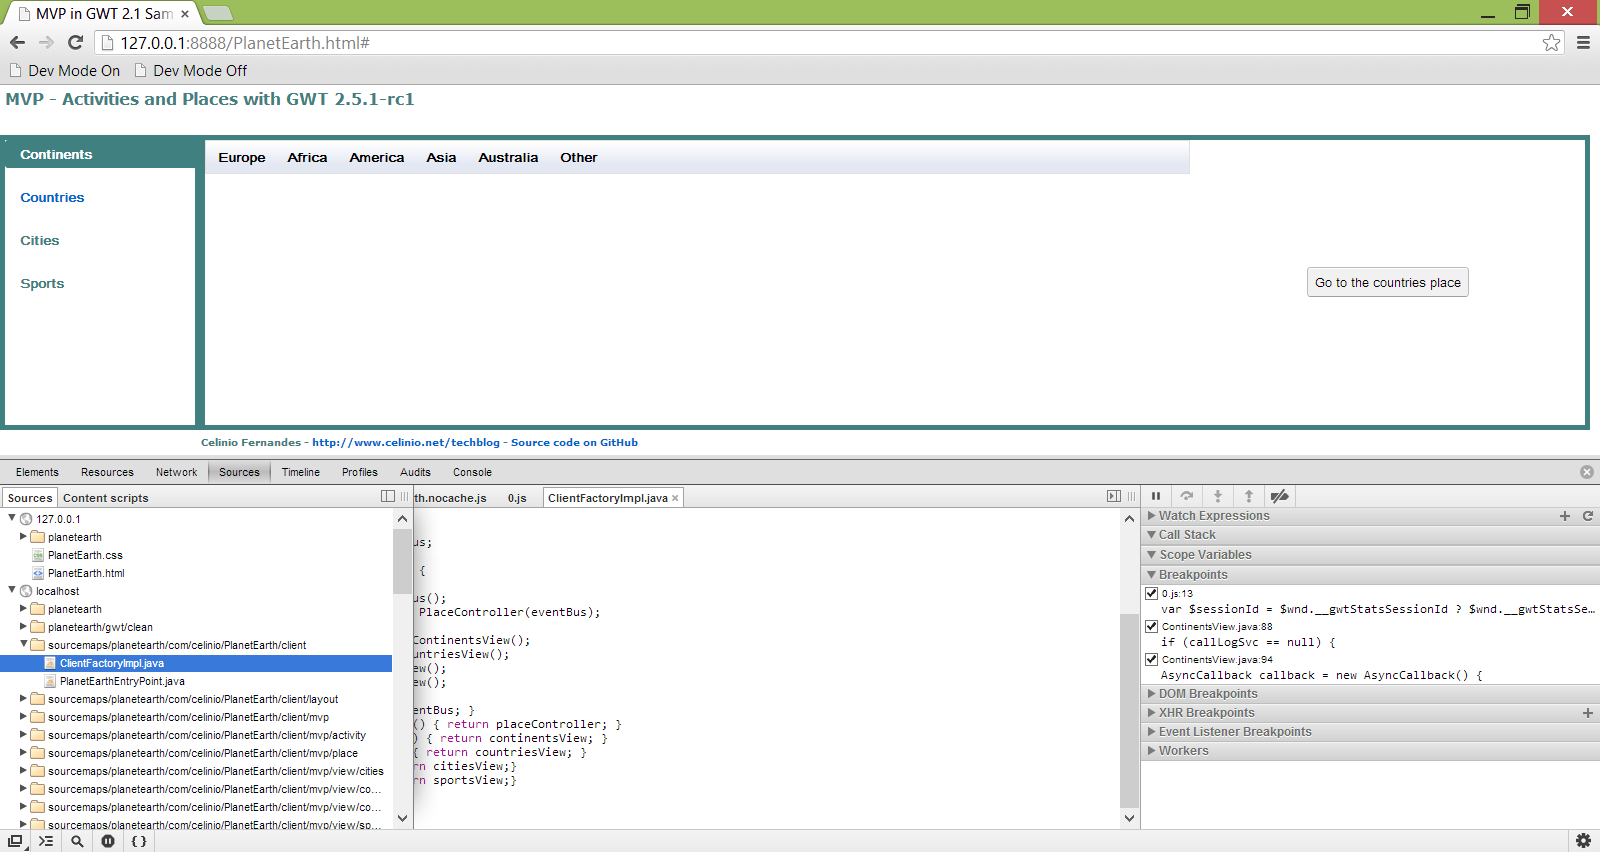 COBOL IT developer studio – Celinio's technical blog